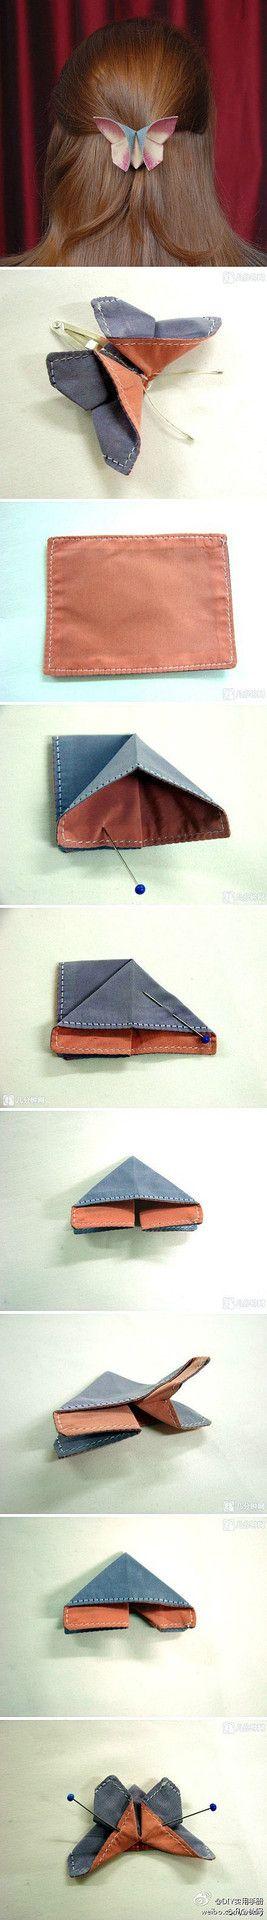 handmadepride:  Click here for more tutorials.